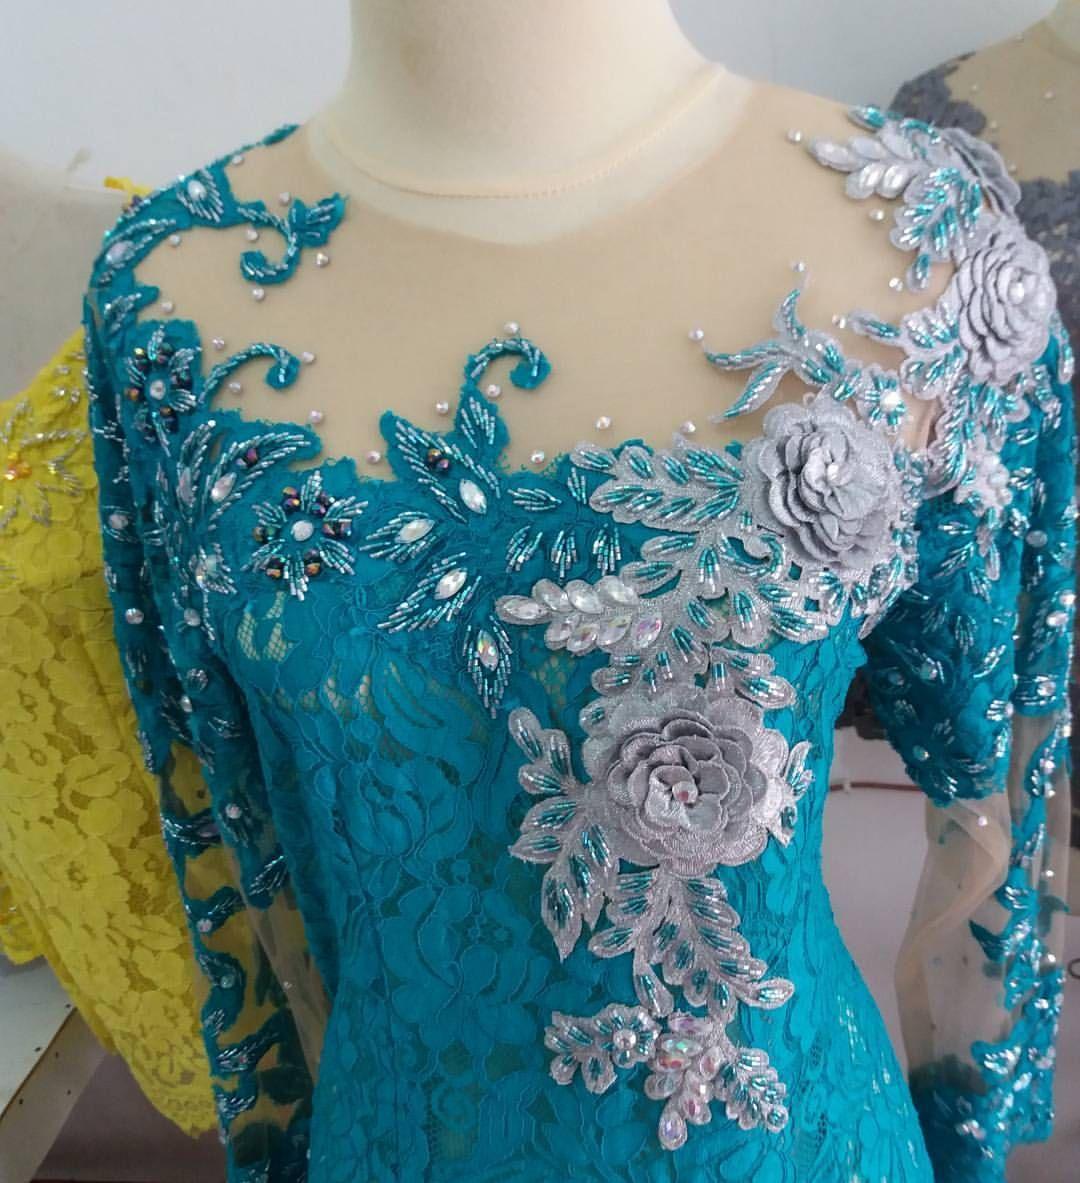 Henny Farida Simanungkalit Di Instagram Kebayapesta Kebayamodern Payetjepang Bordirtempel Penjahitk Model Pakaian Wanita Pakaian Wanita Model Baju Wanita